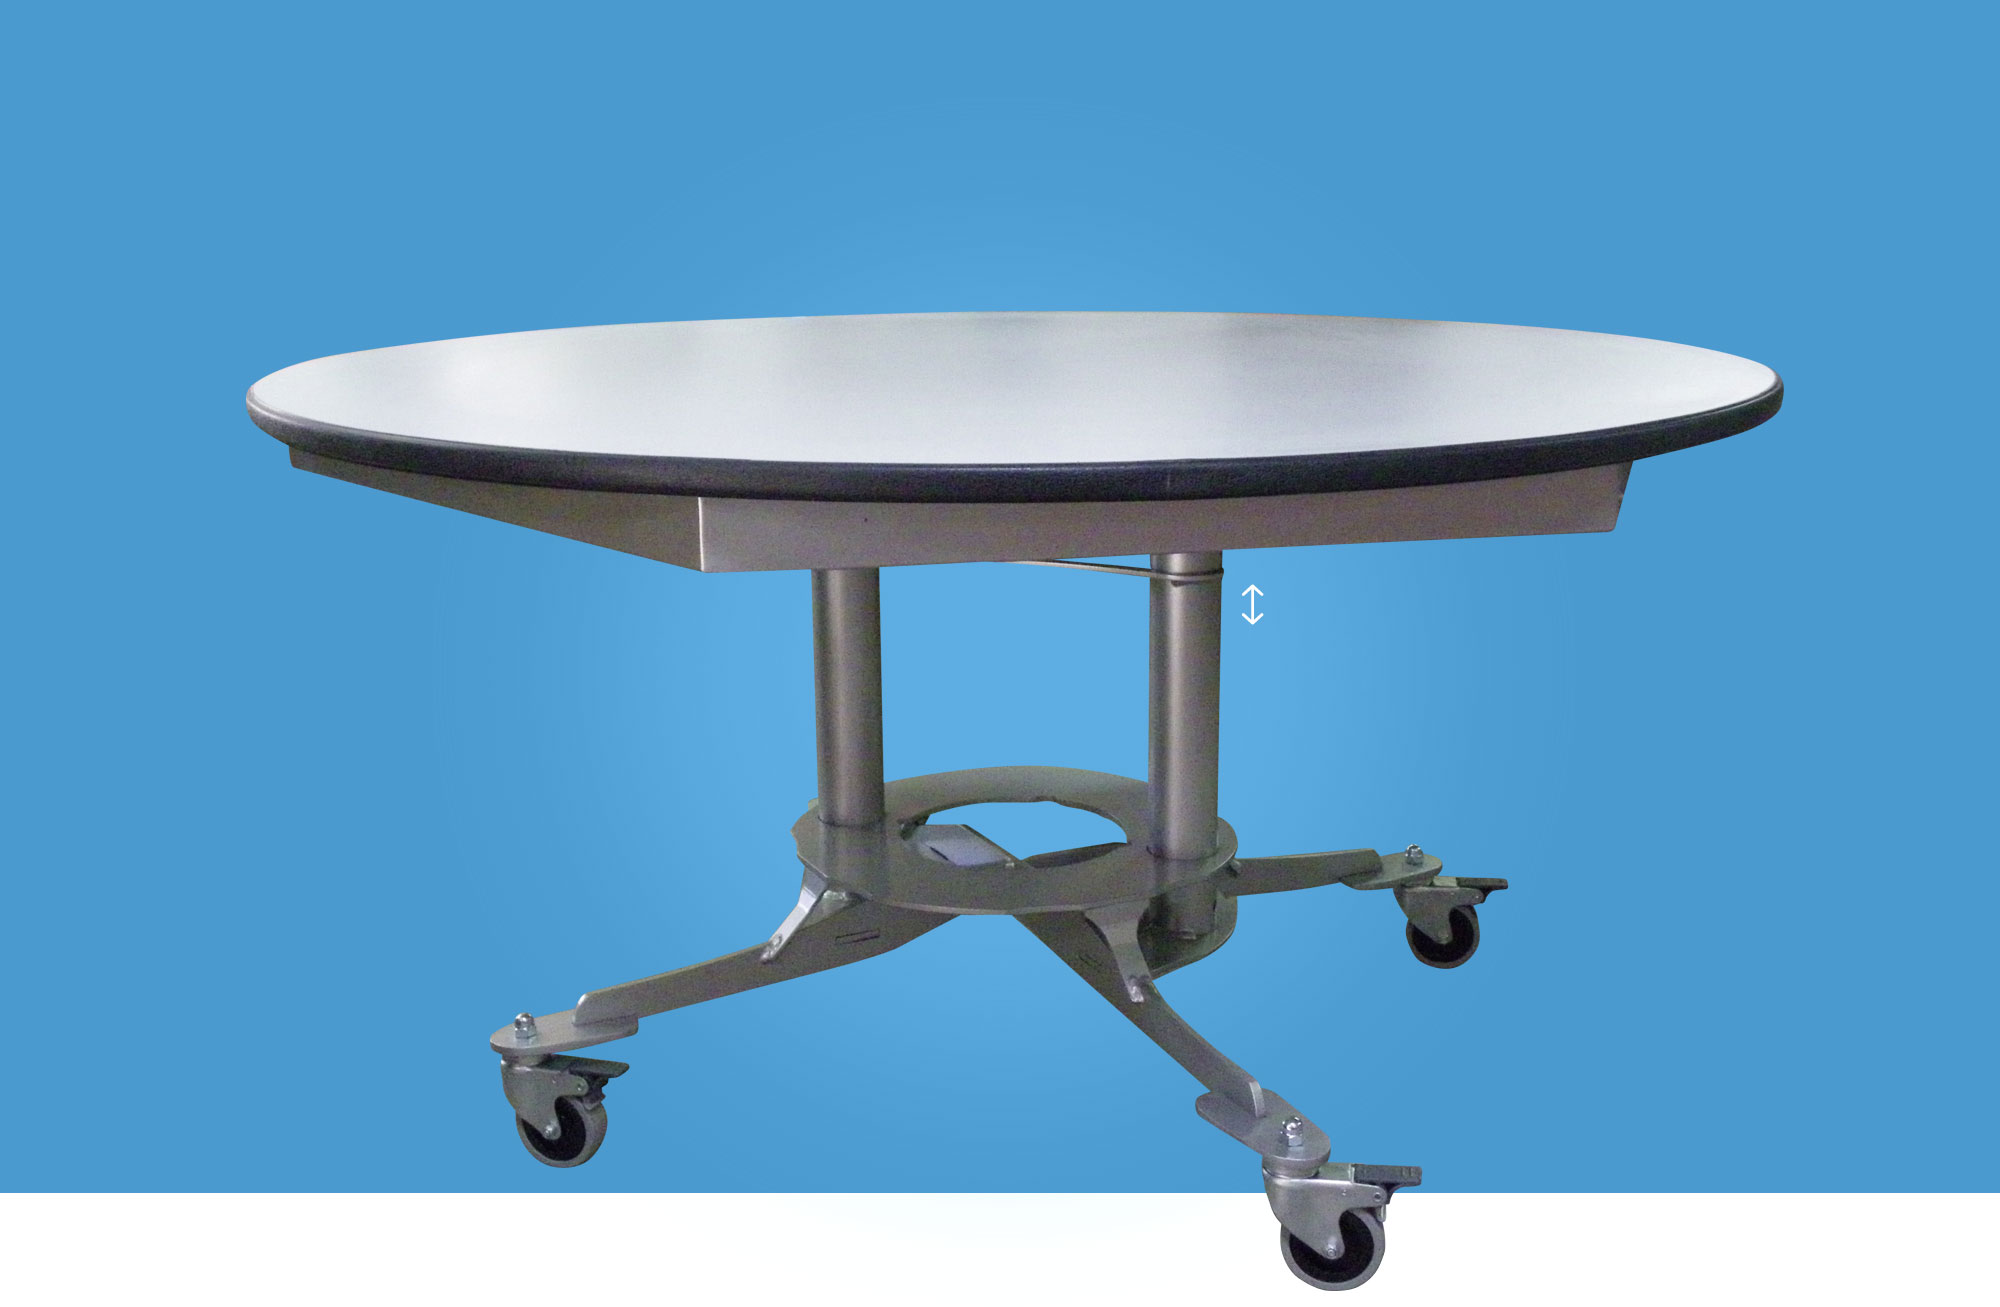 Hephaïstos mobilier PMR inclusion scolaire ergonomique ouranos table ergonomique